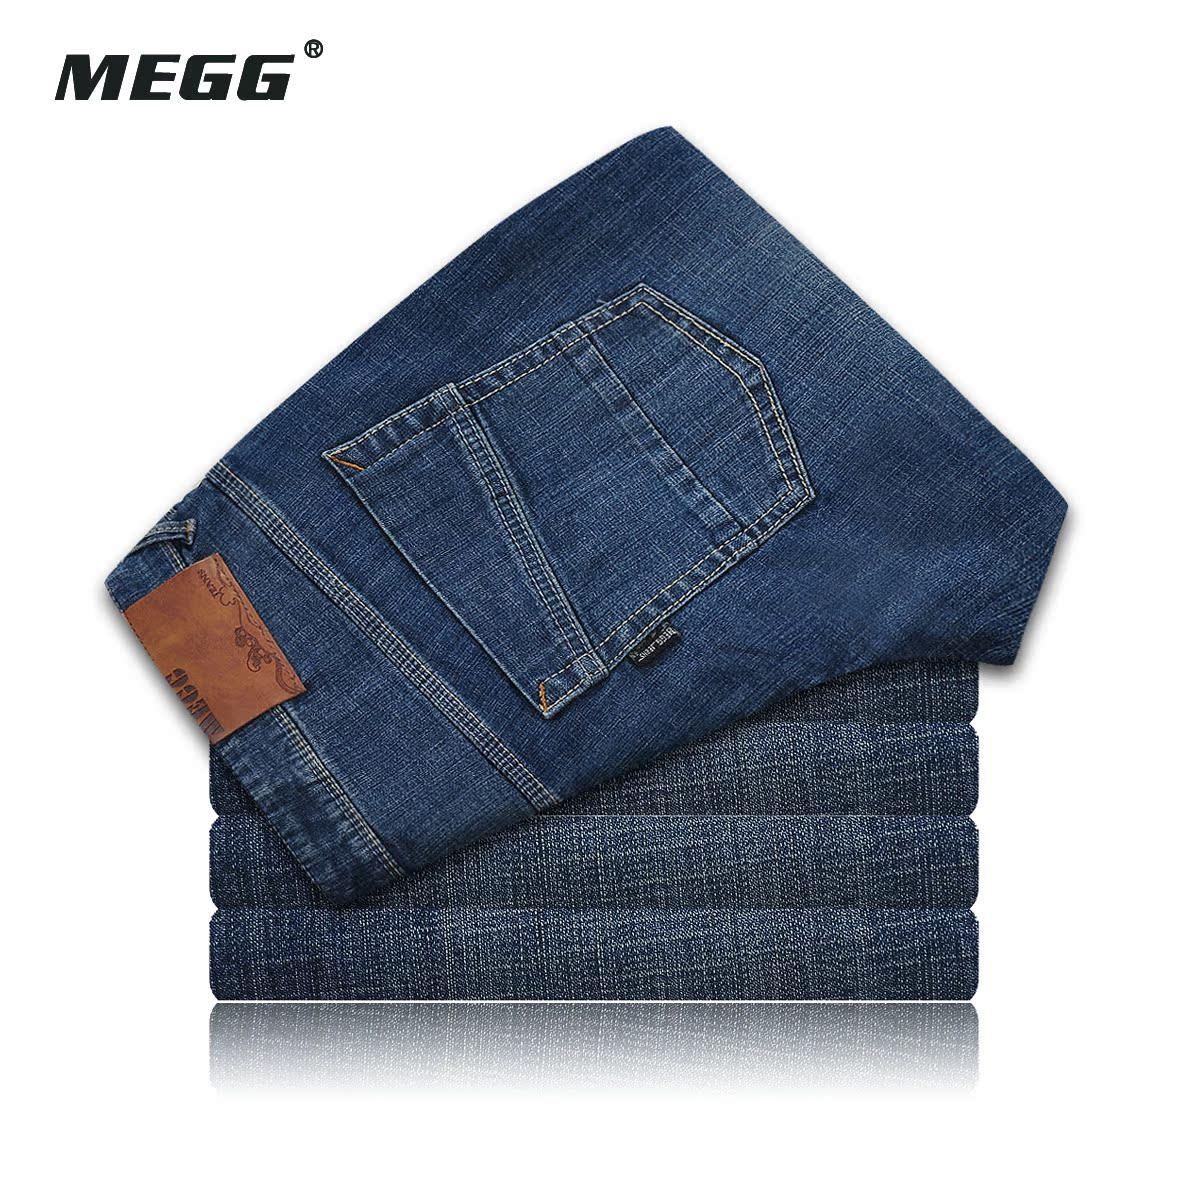 megg Men's khaki pants men's casual pants Slim trousers narrow pants male 2 color optional